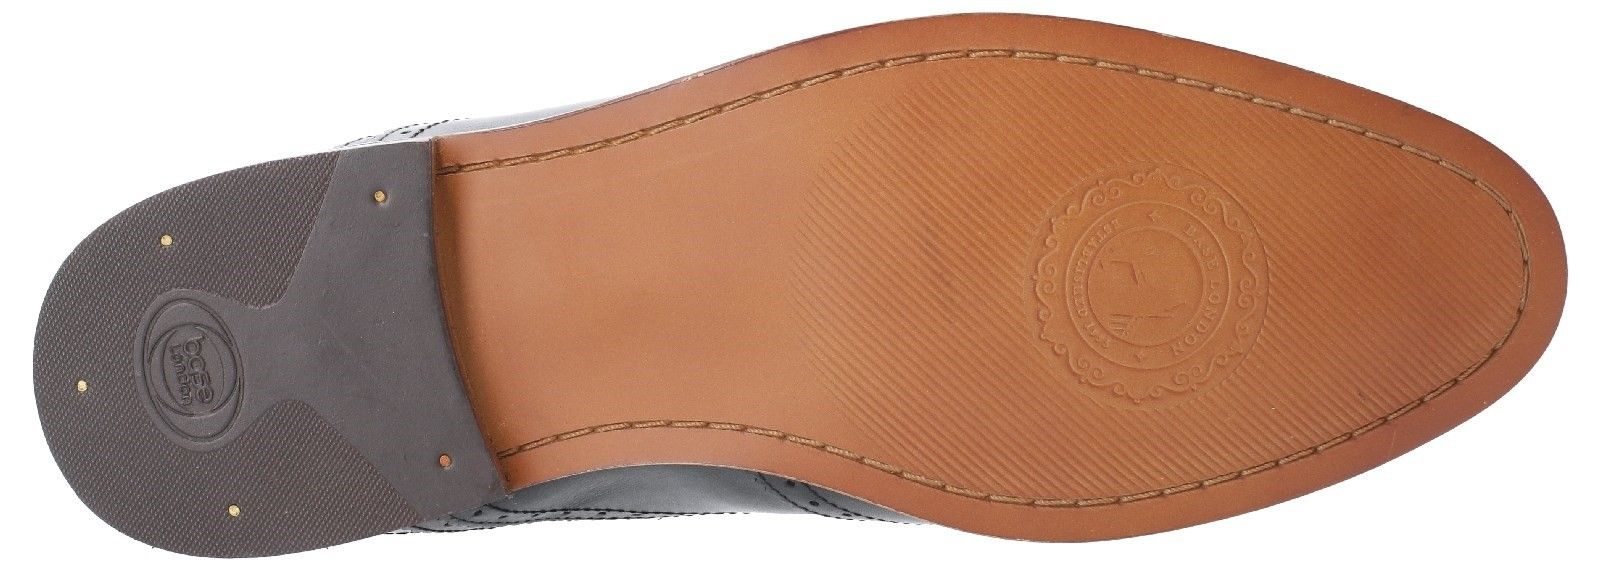 Focus Waxy Lace Up Brogue Shoe